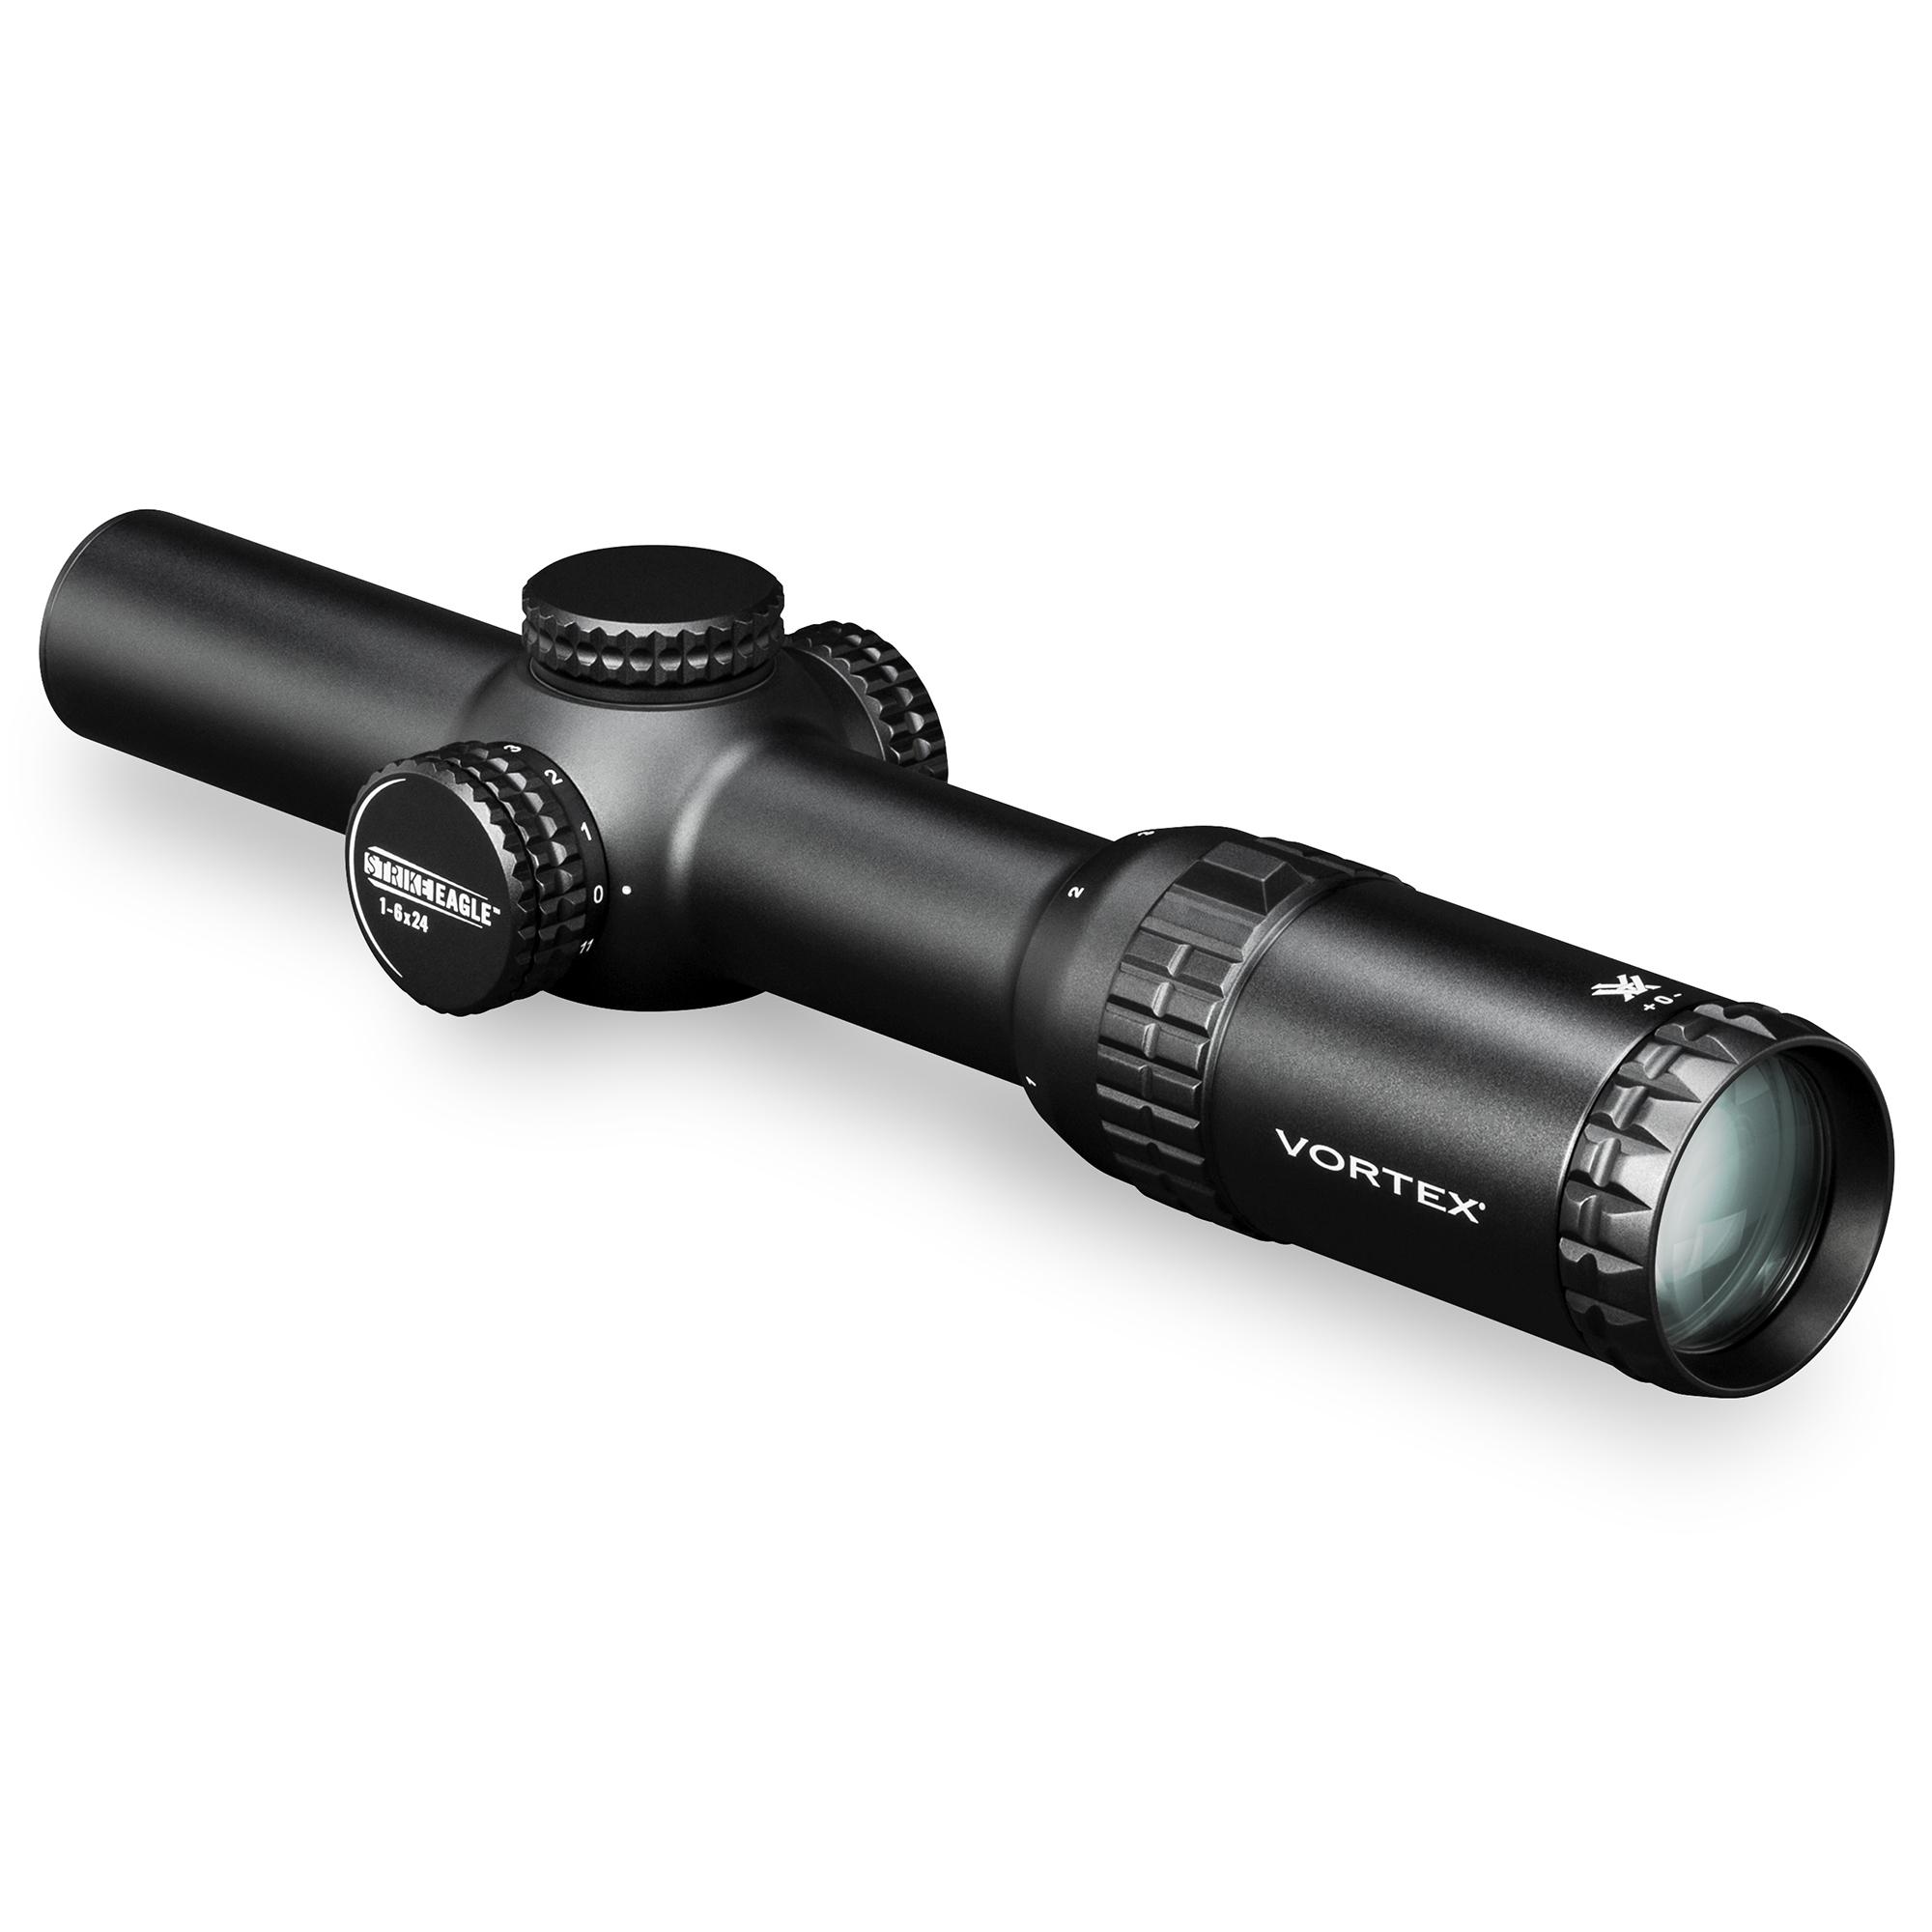 Vortex Strike Eagle Riflescope